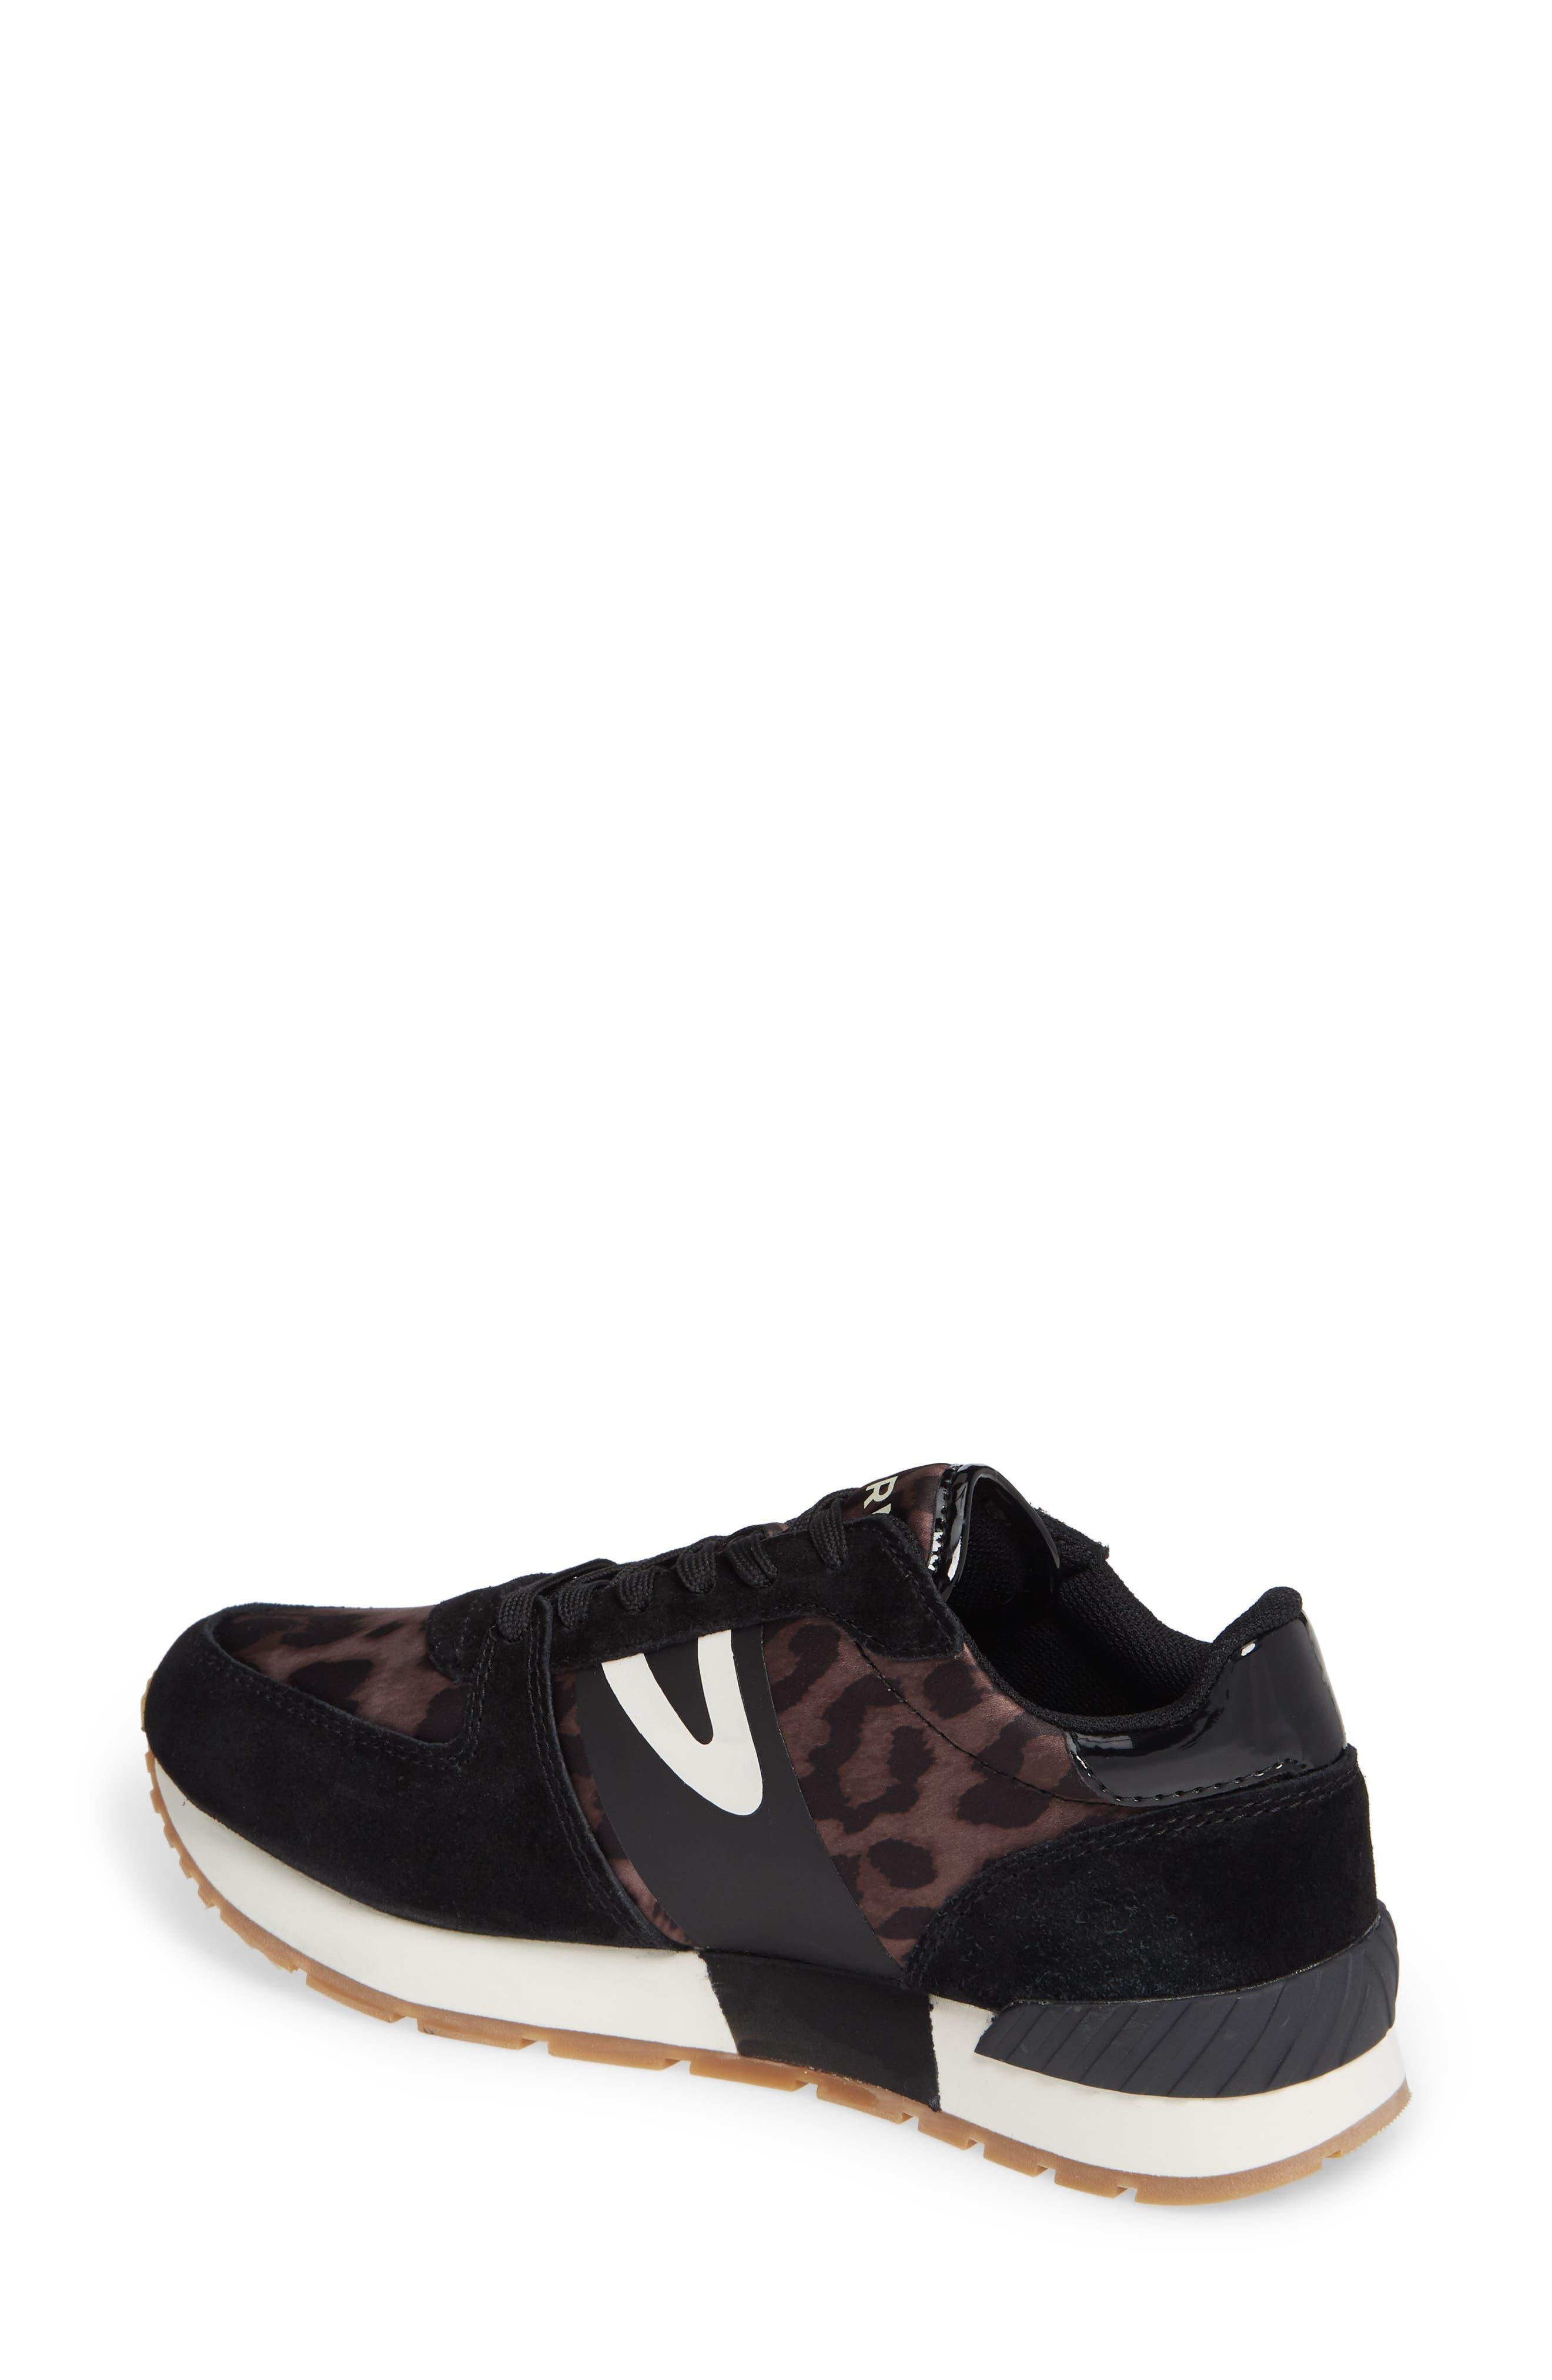 Loyola 9 Sneaker,                             Alternate thumbnail 2, color,                             002